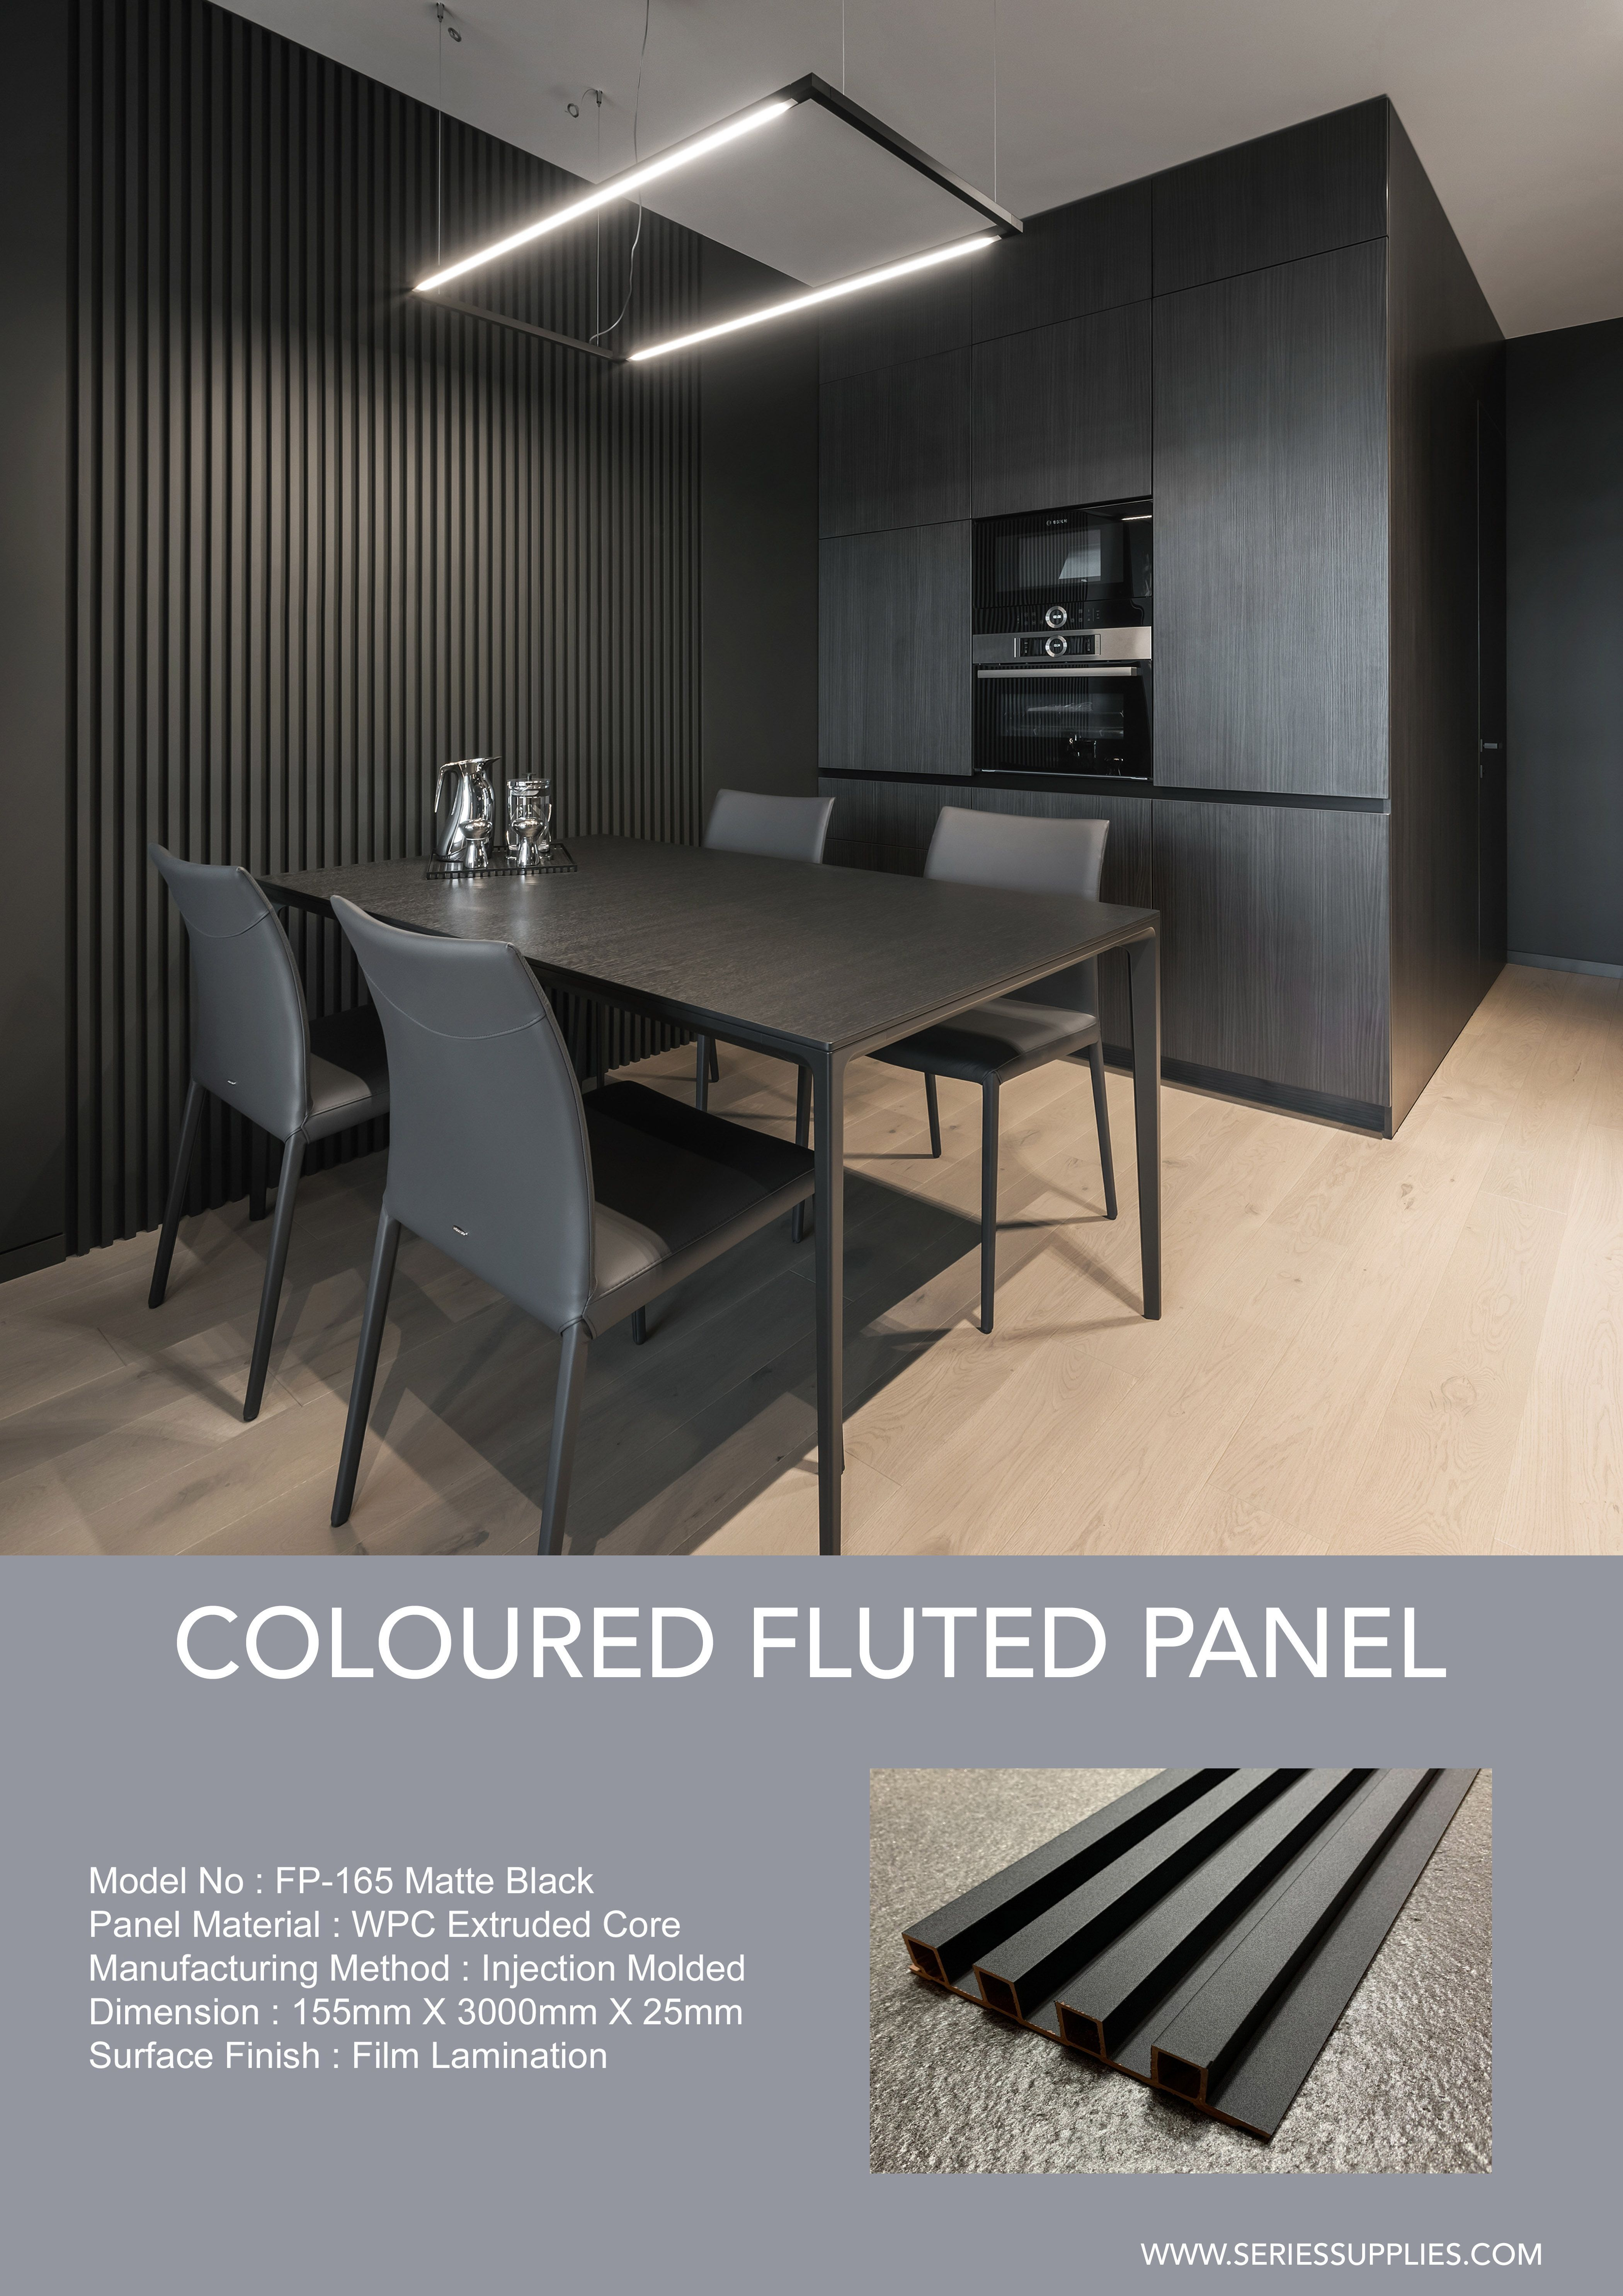 BLACK SLATS WALL PANEL in 2020 | White paneling, Wood slat ...